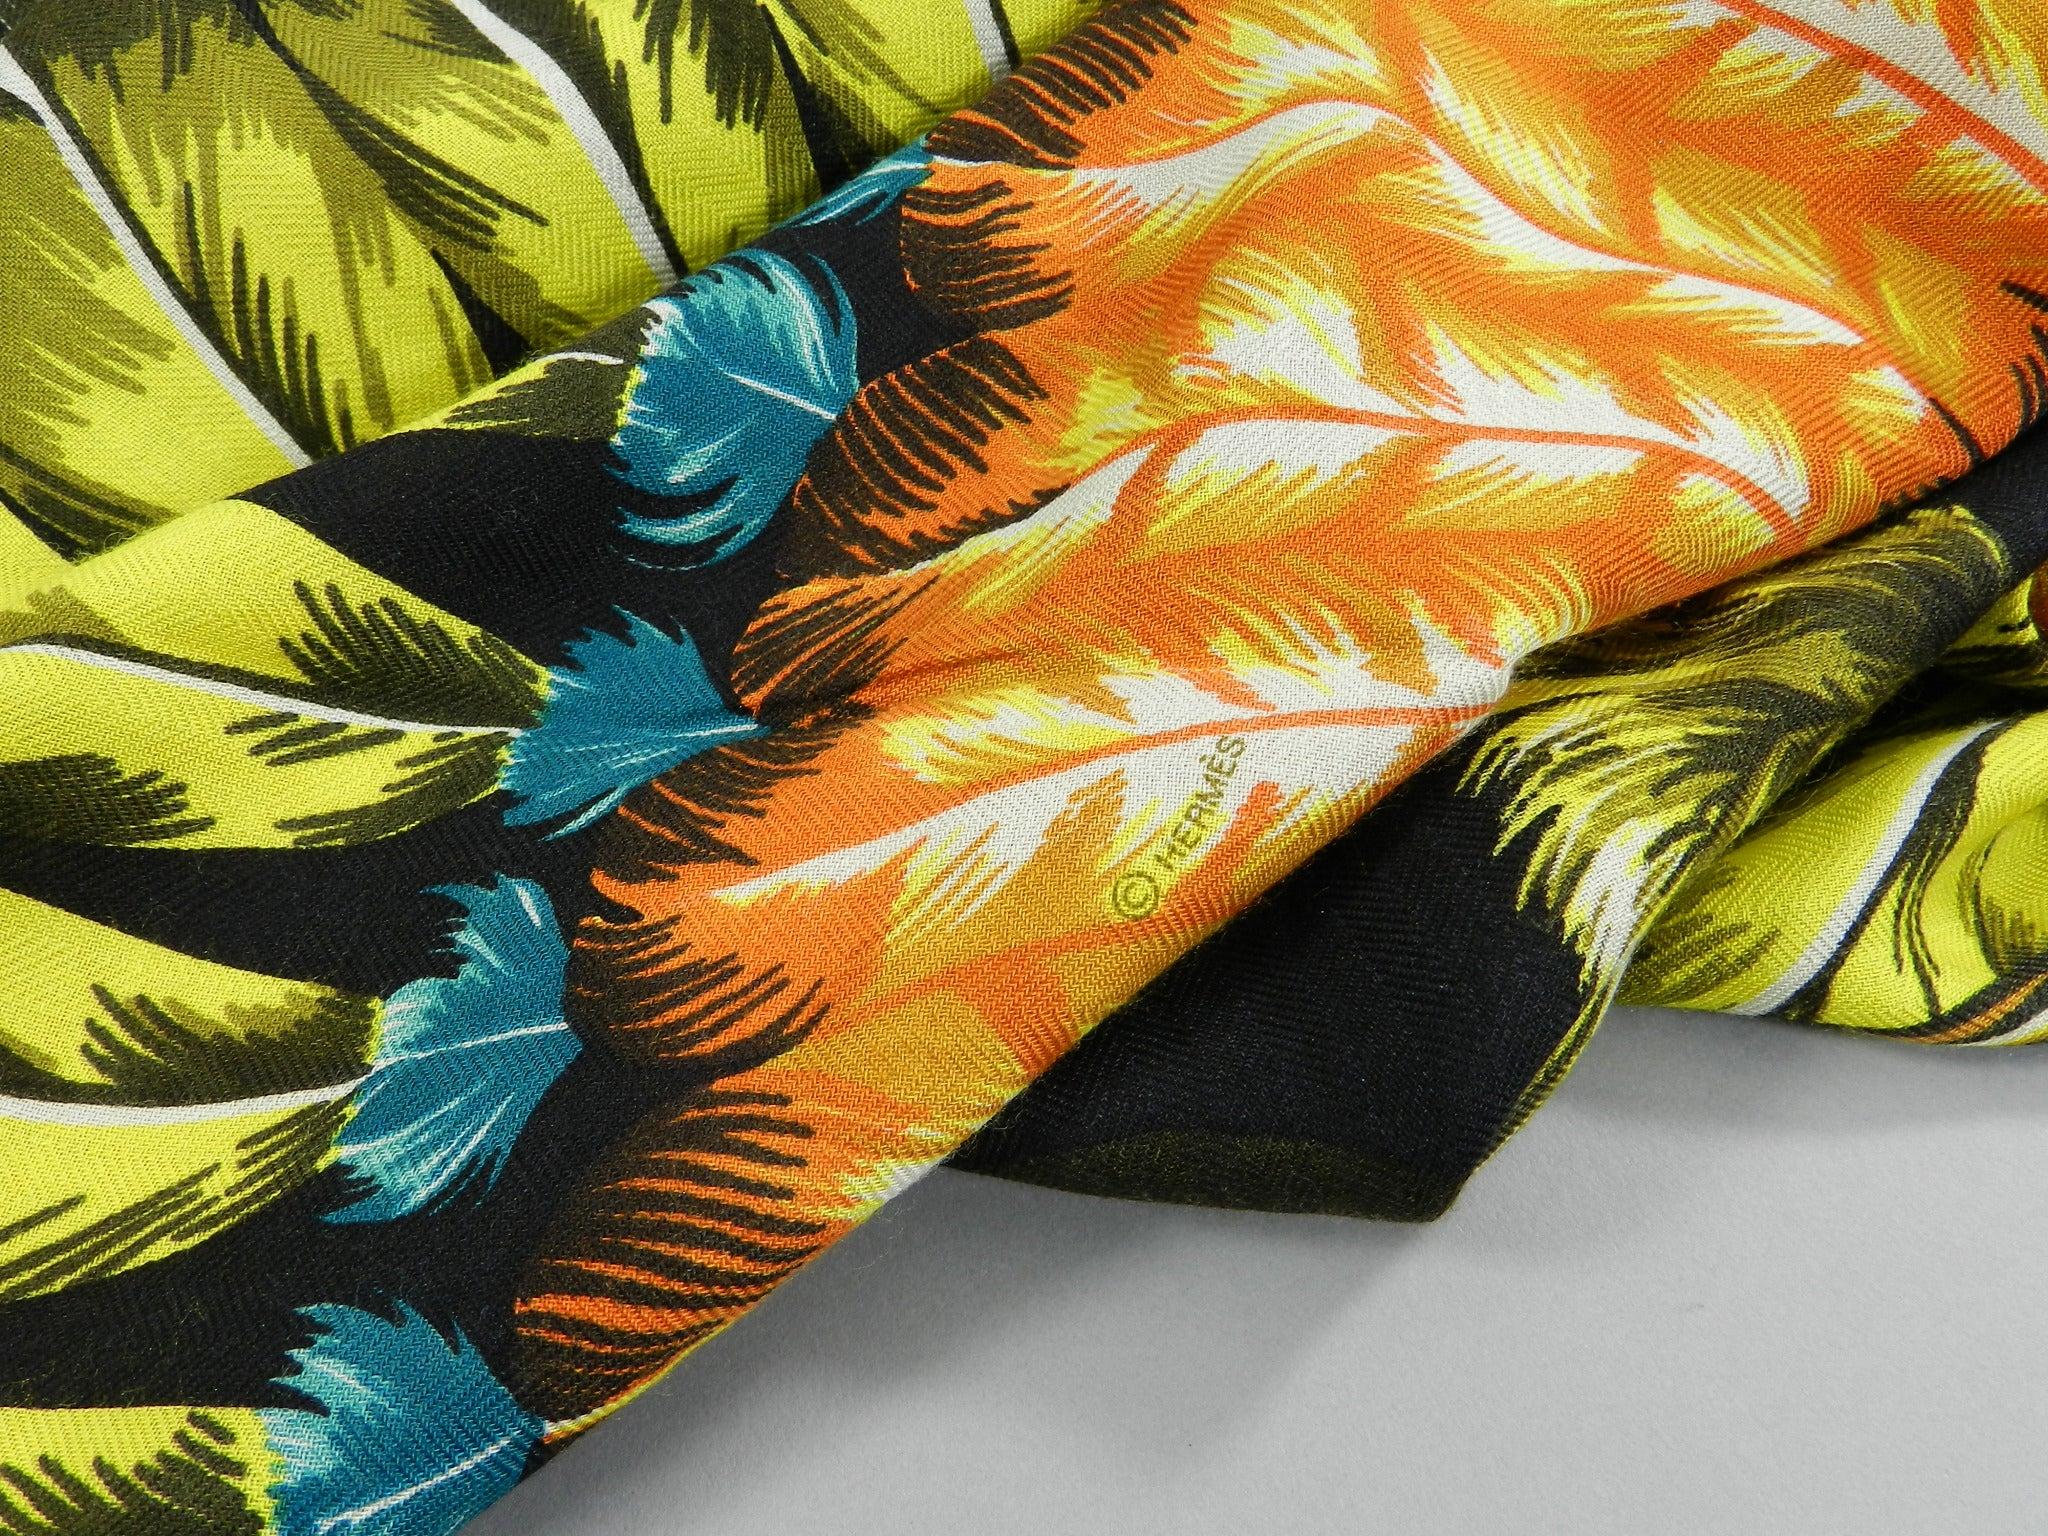 668525de0a10 Hermes Cashmere Silk Shawl 180 x 64 cm - Brazil at 1stdibs